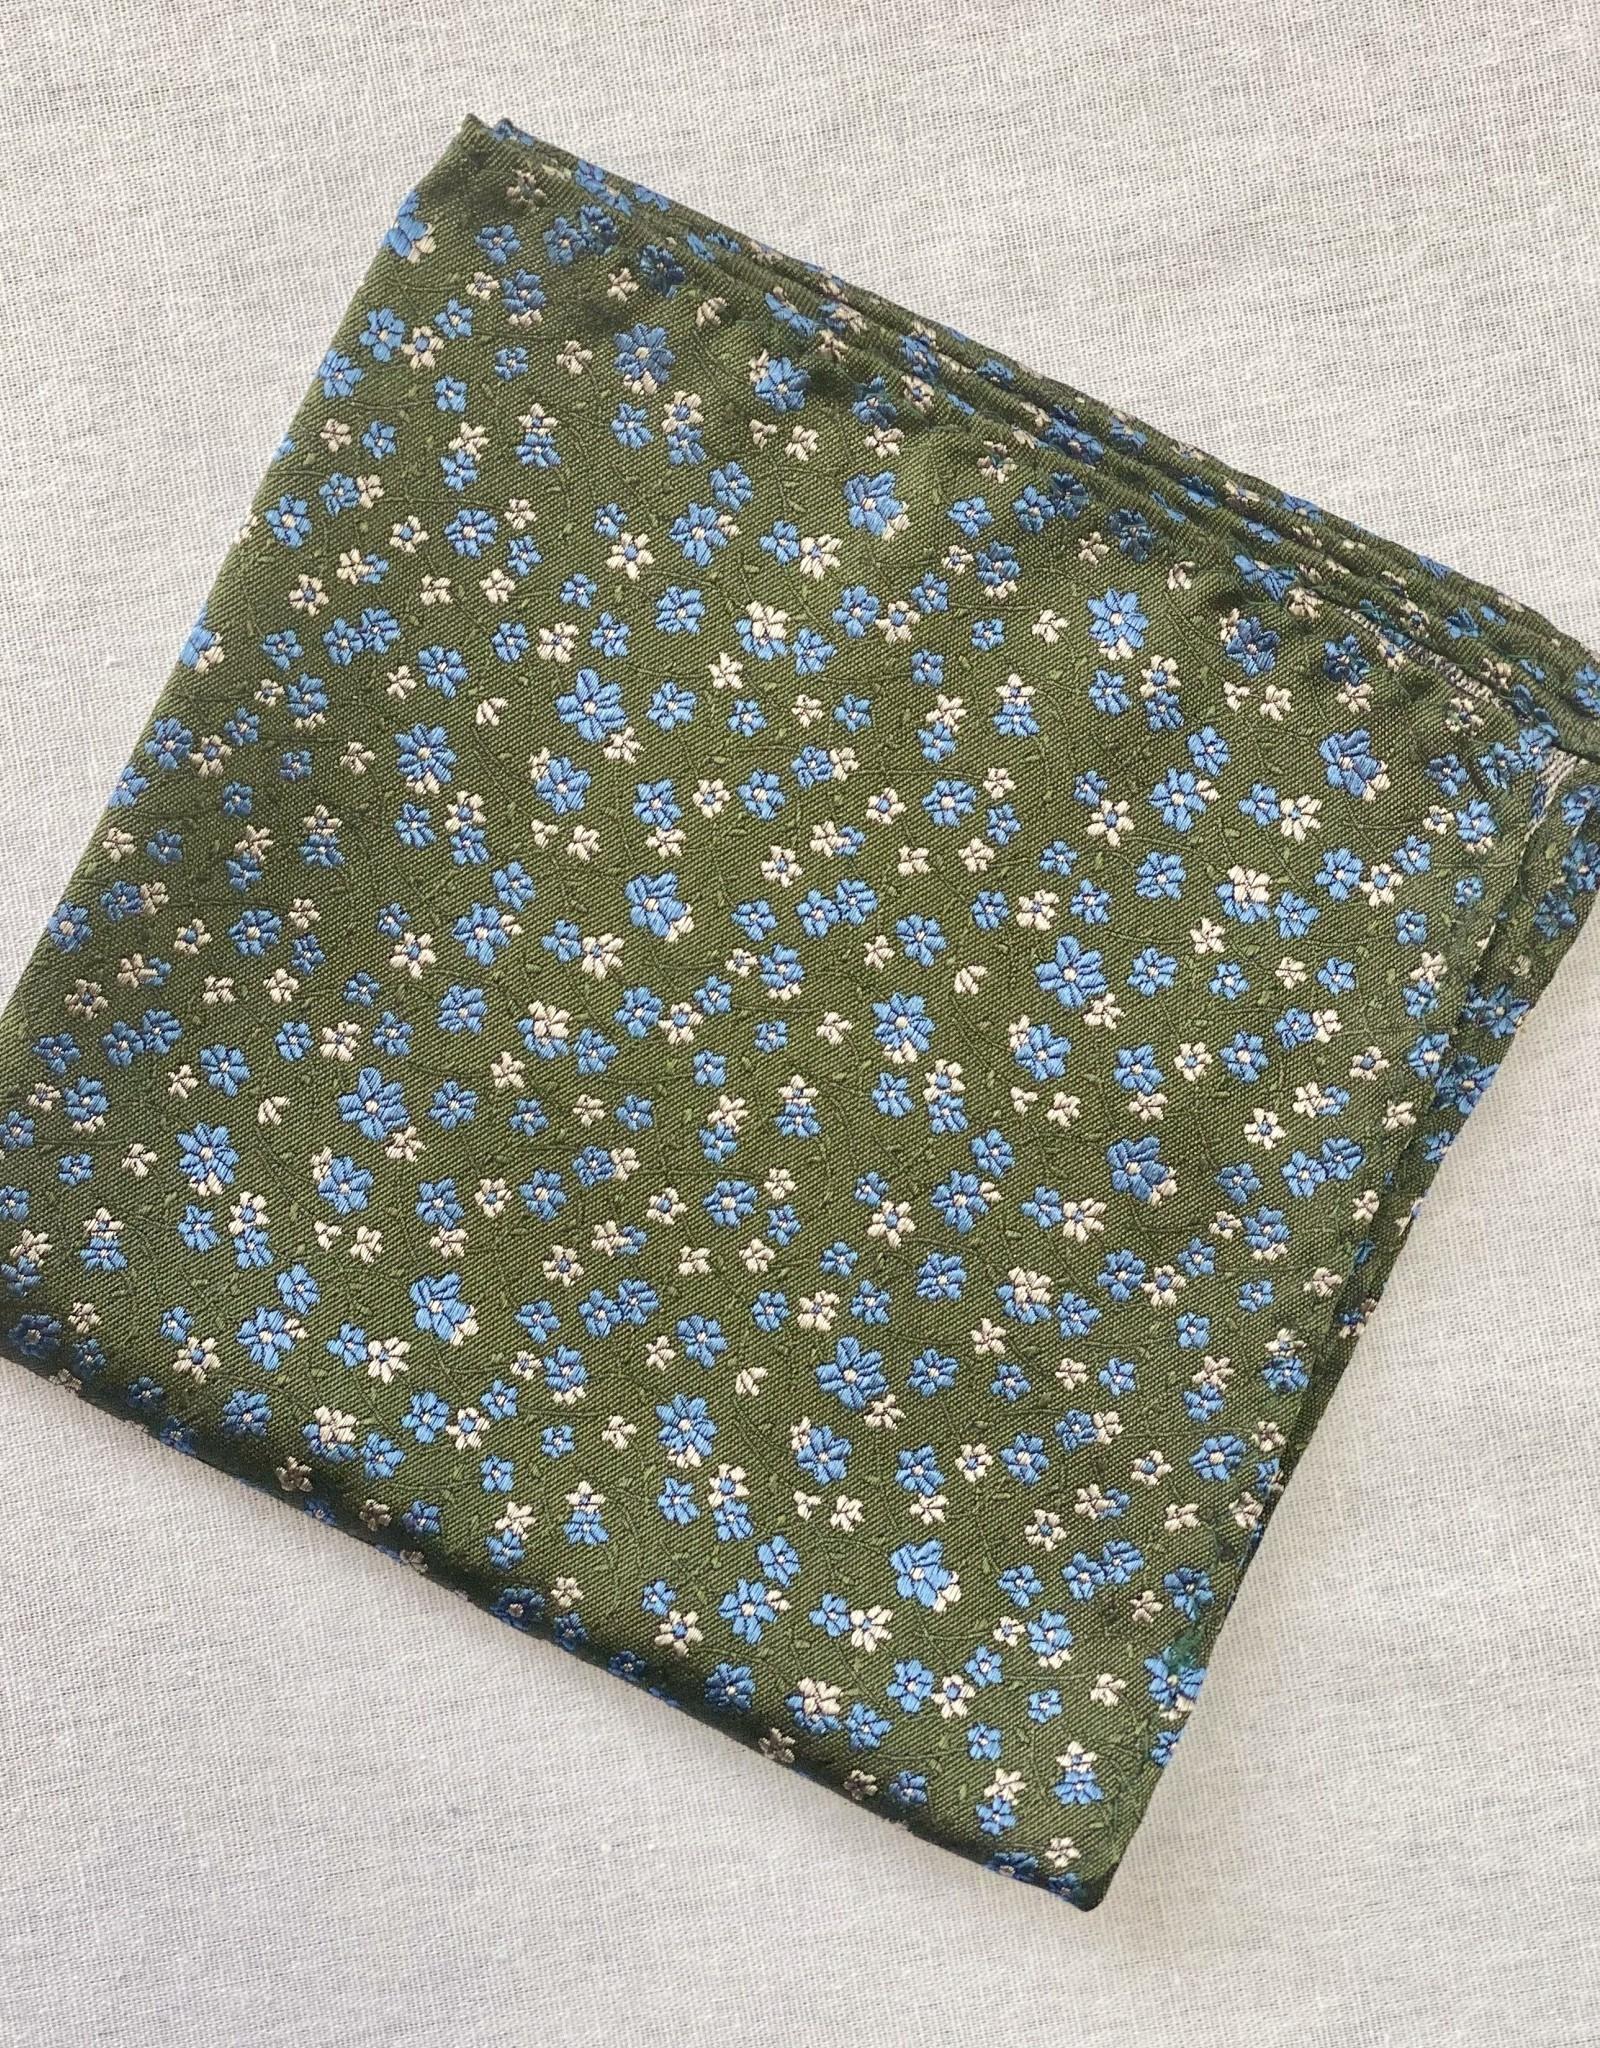 The Tie Bar Pocket Square